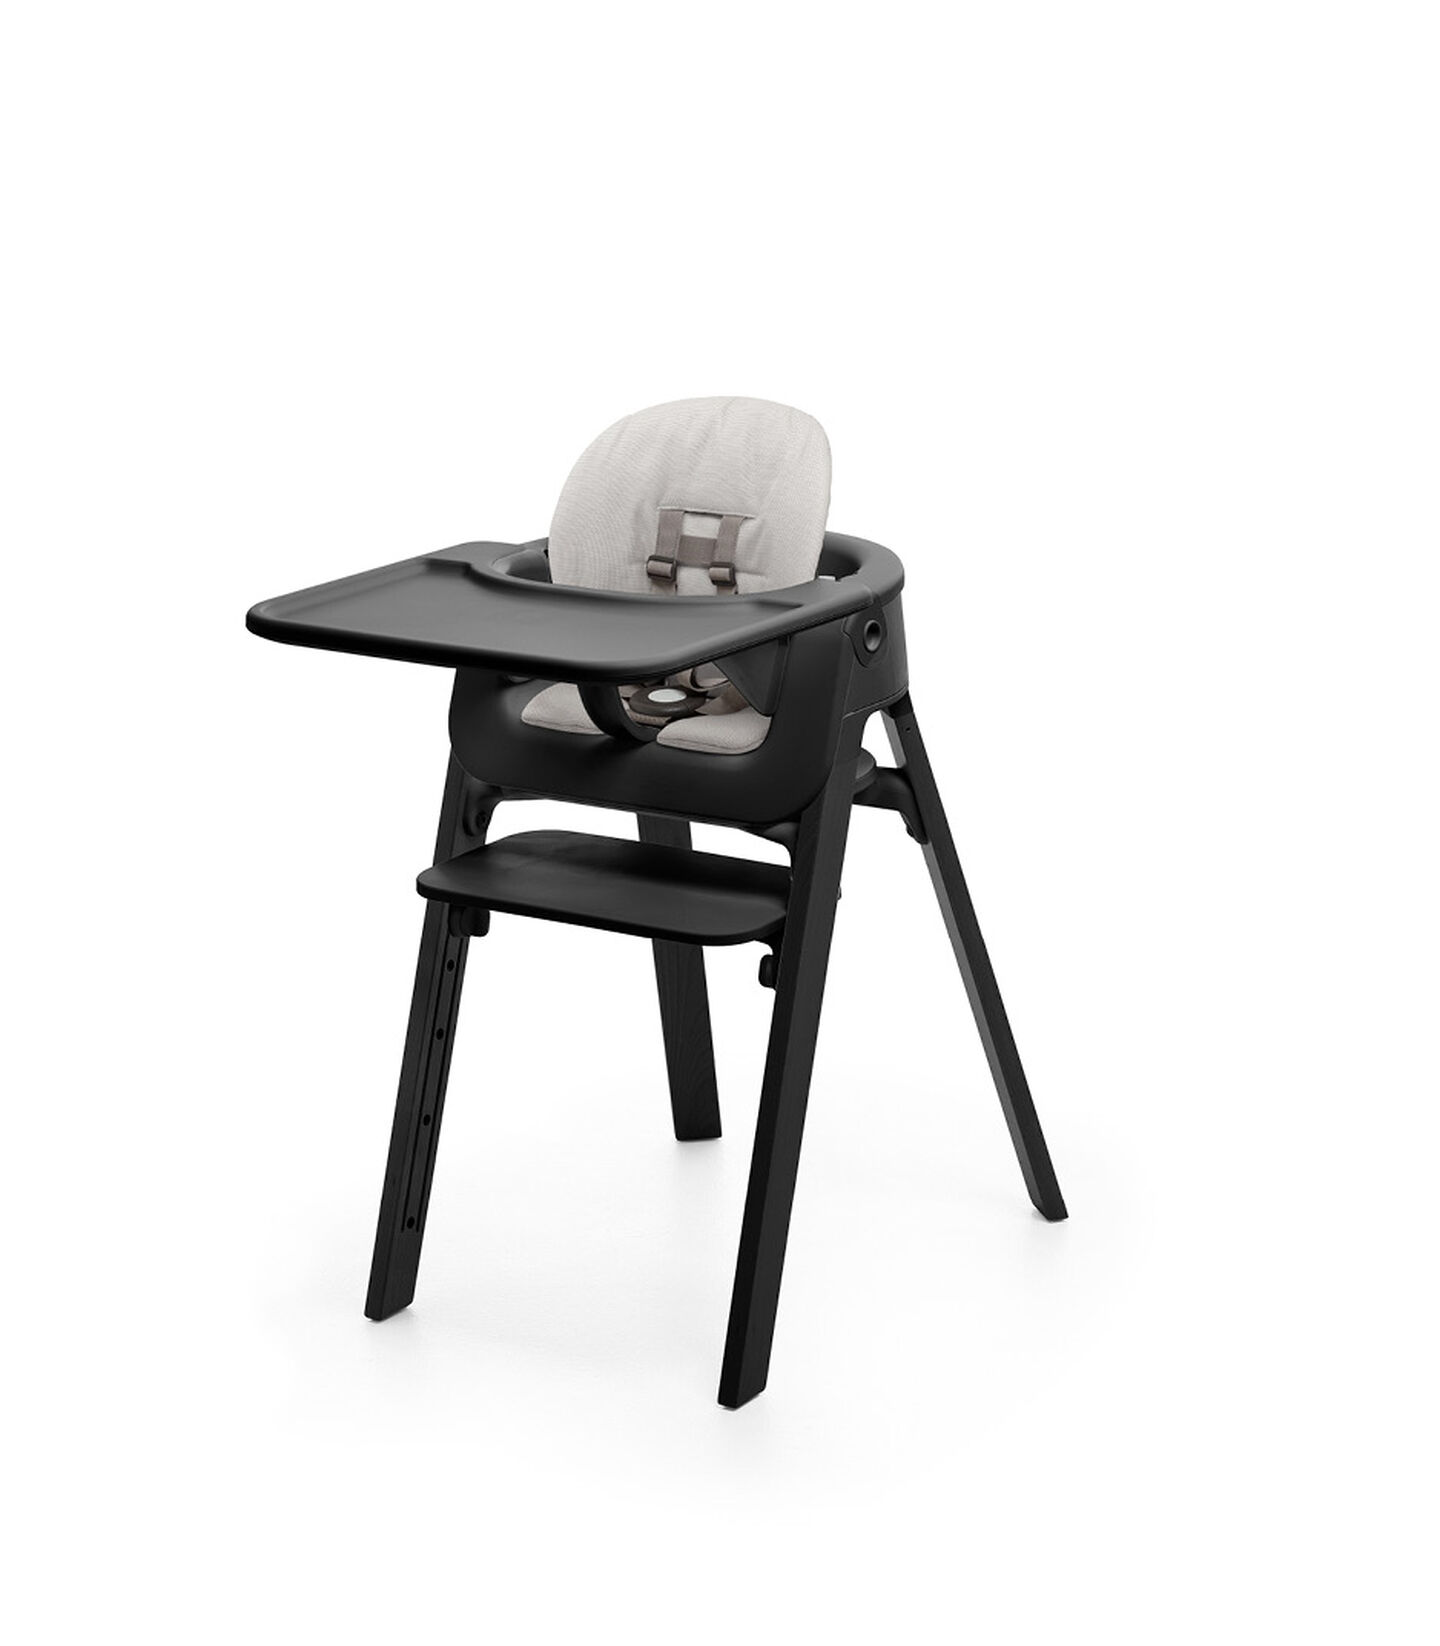 Stokke® Steps™ HC Complete Bundle Black w Grey Cushion, Black, mainview view 1